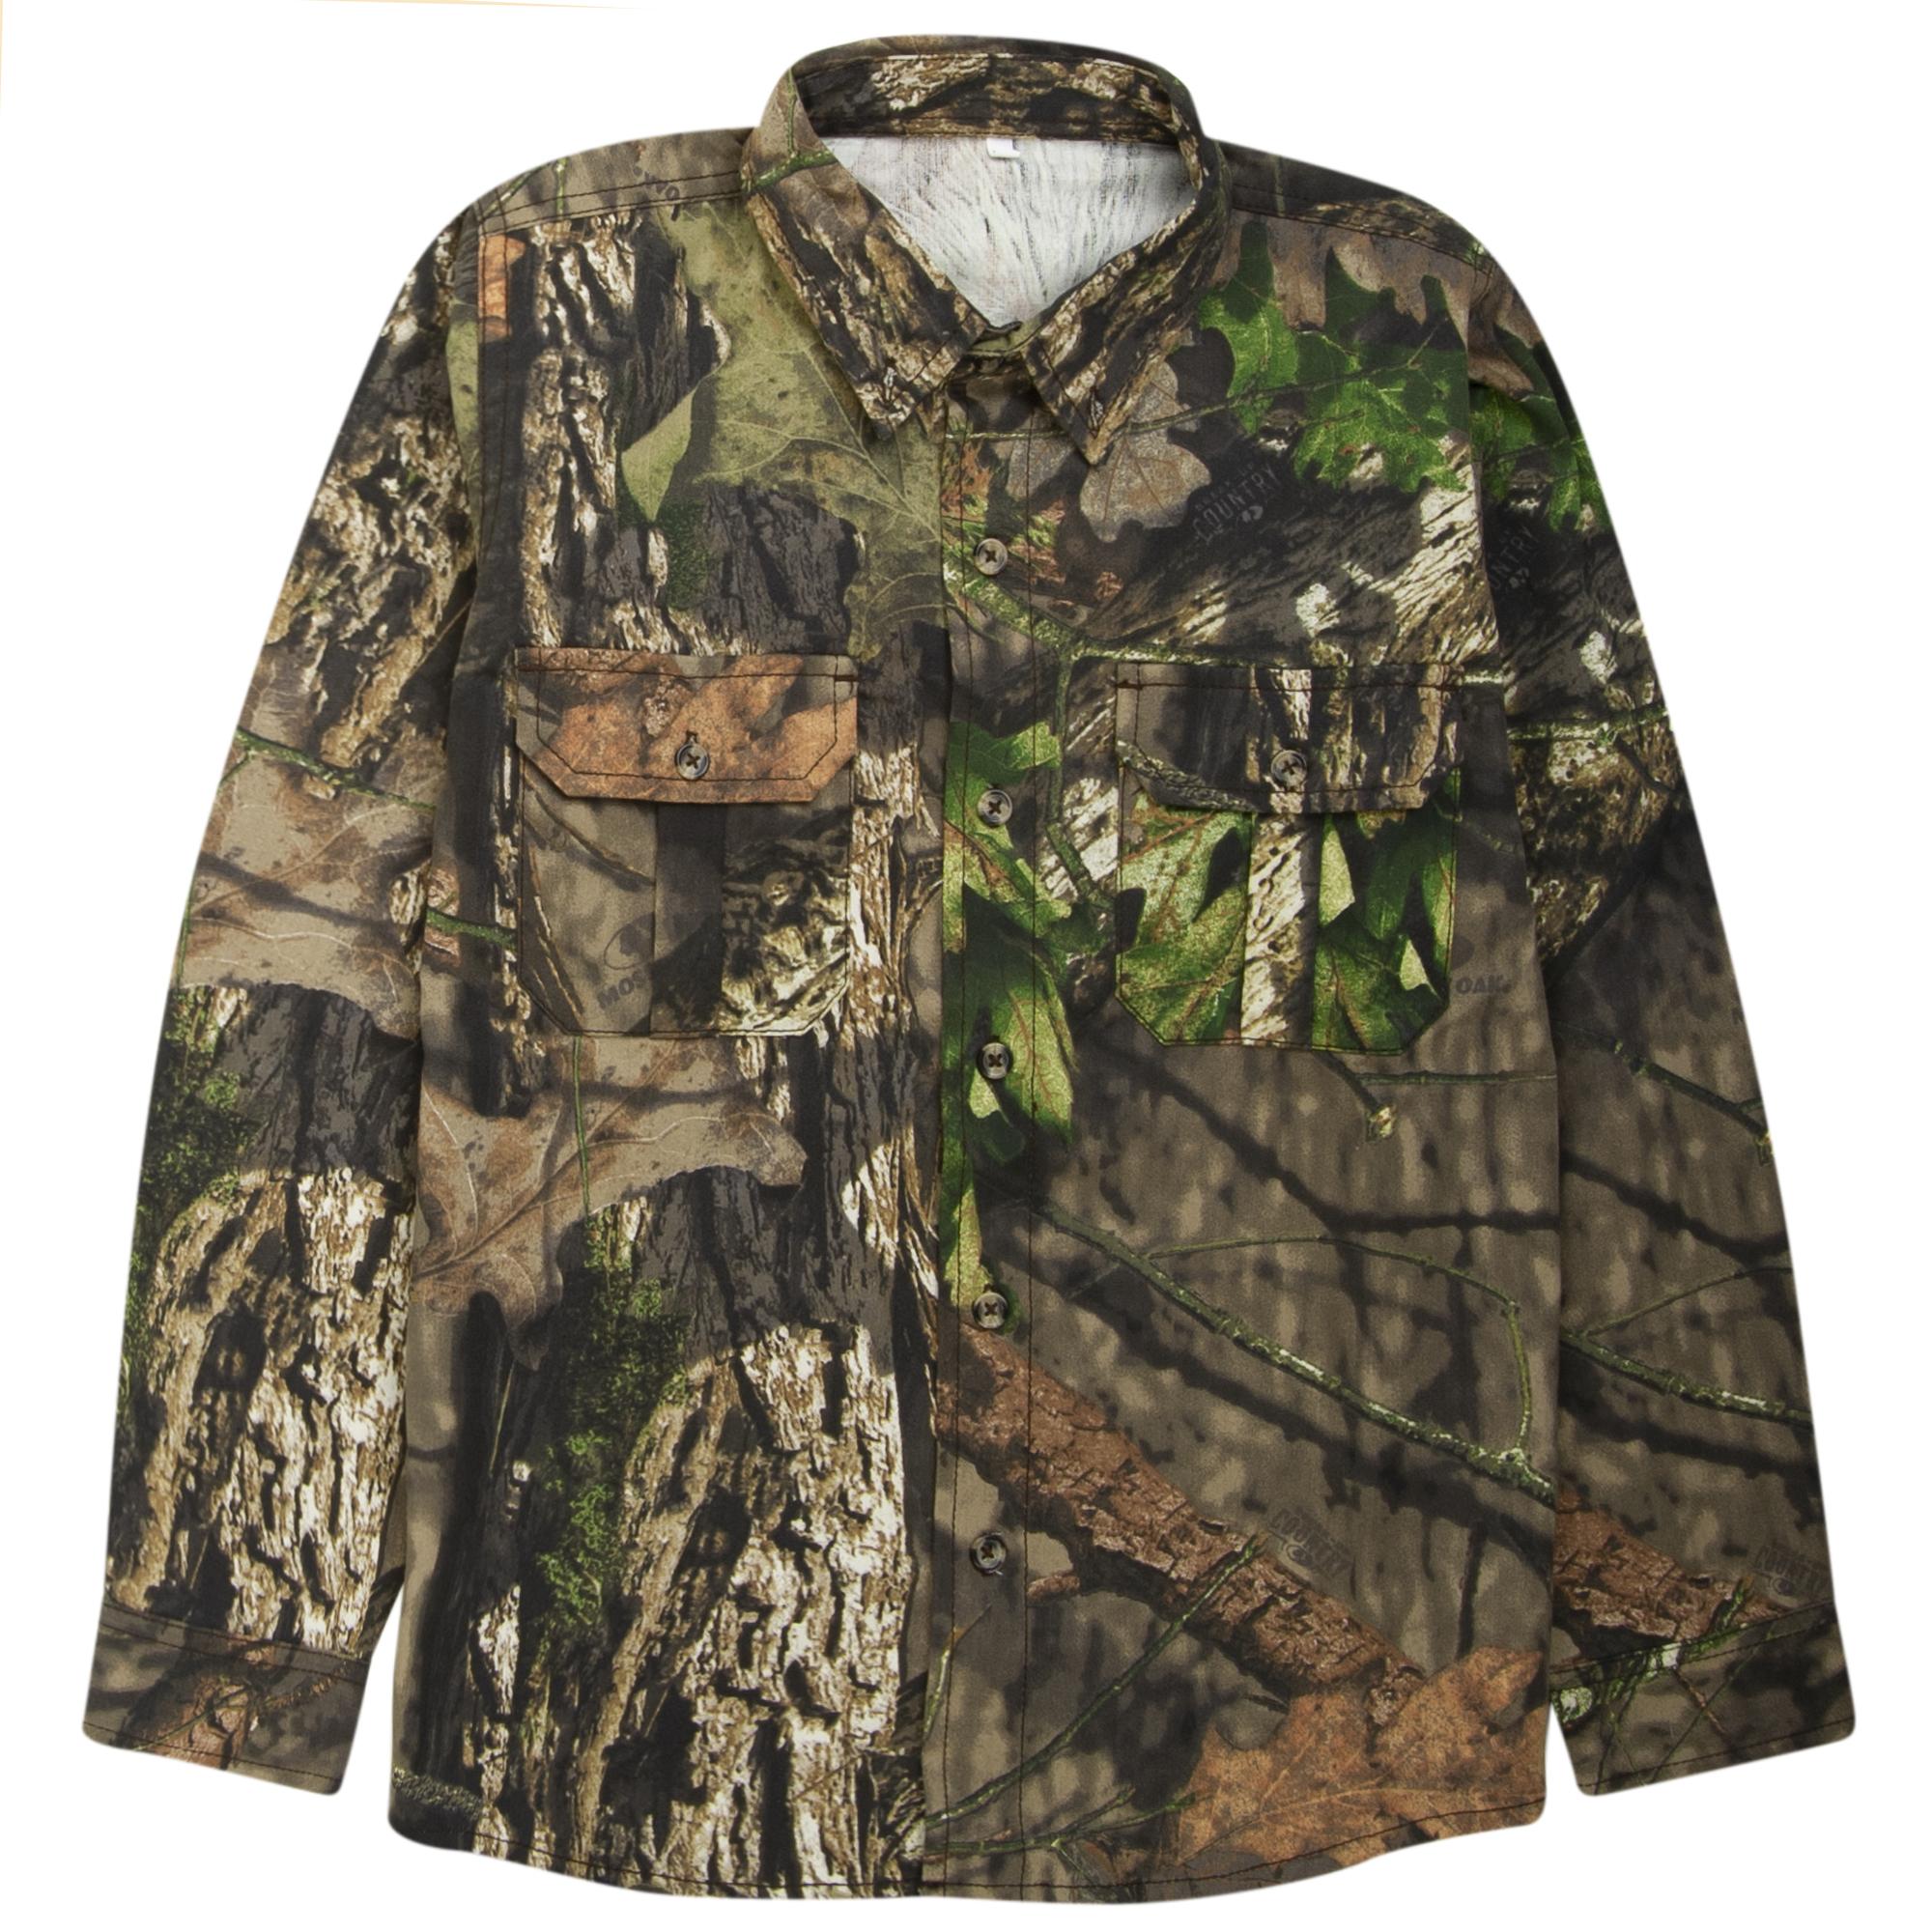 Hunter's Choice Youth Camo Button-Up Shirt, Mossy Oak Break-Up Country